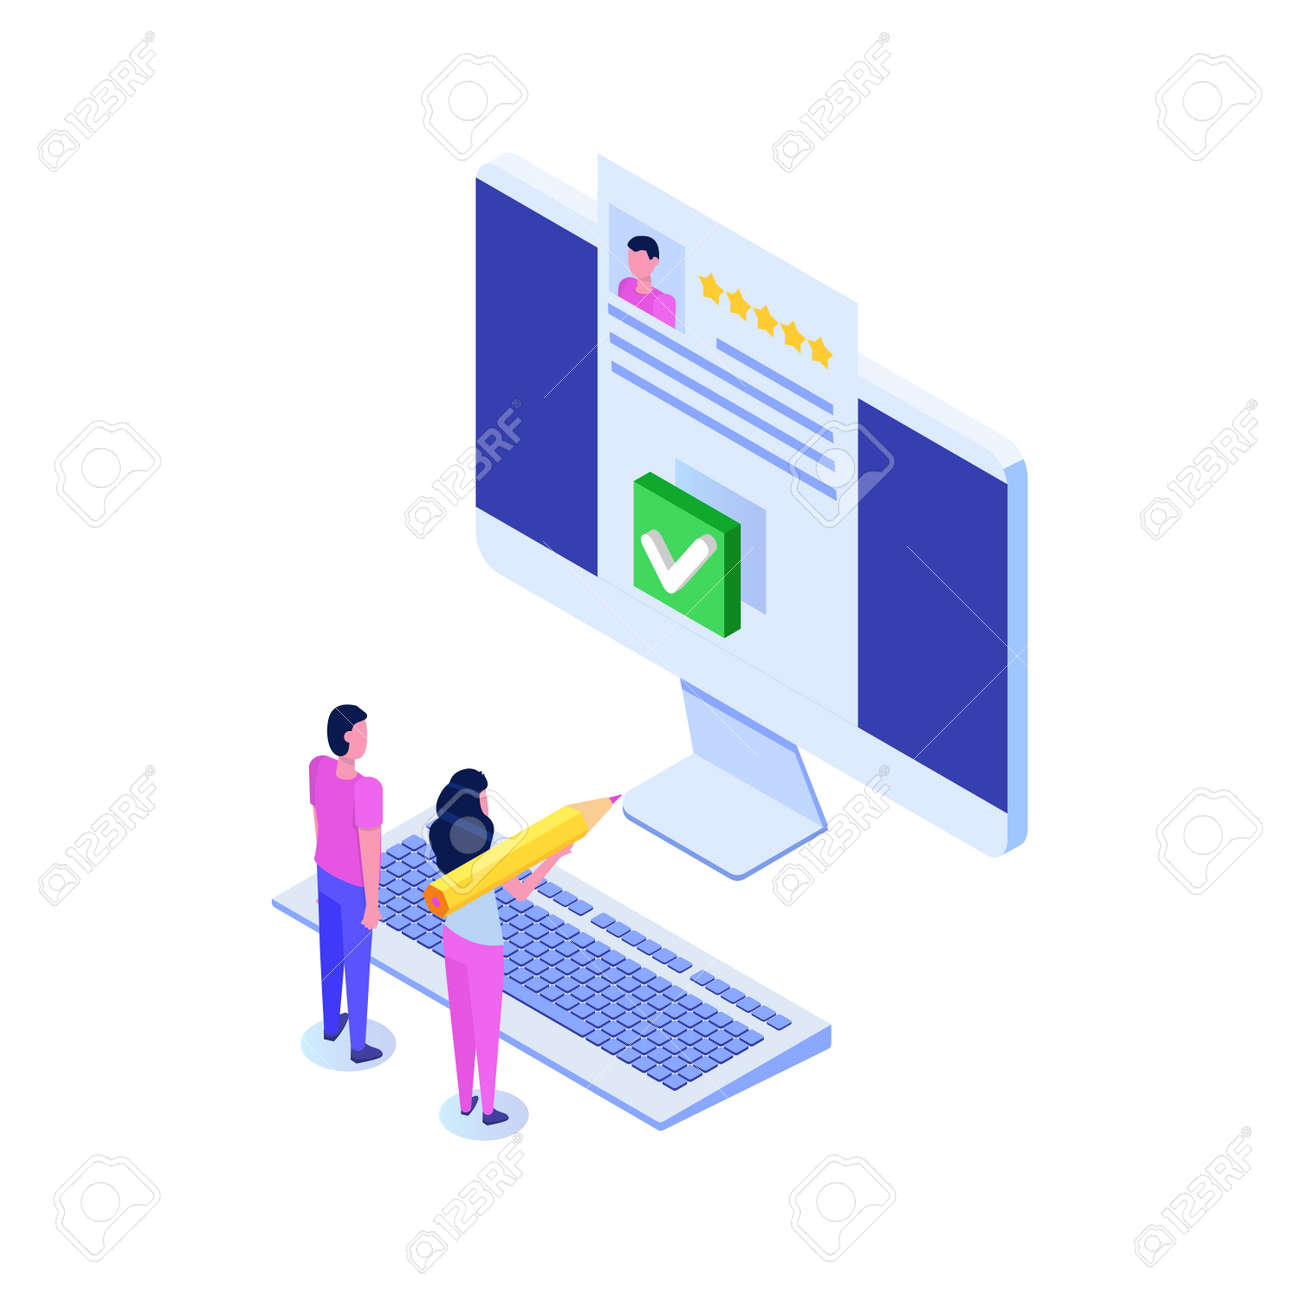 Voting online, e-voting, election internet system isometric concept. Vector illustration - 132290431